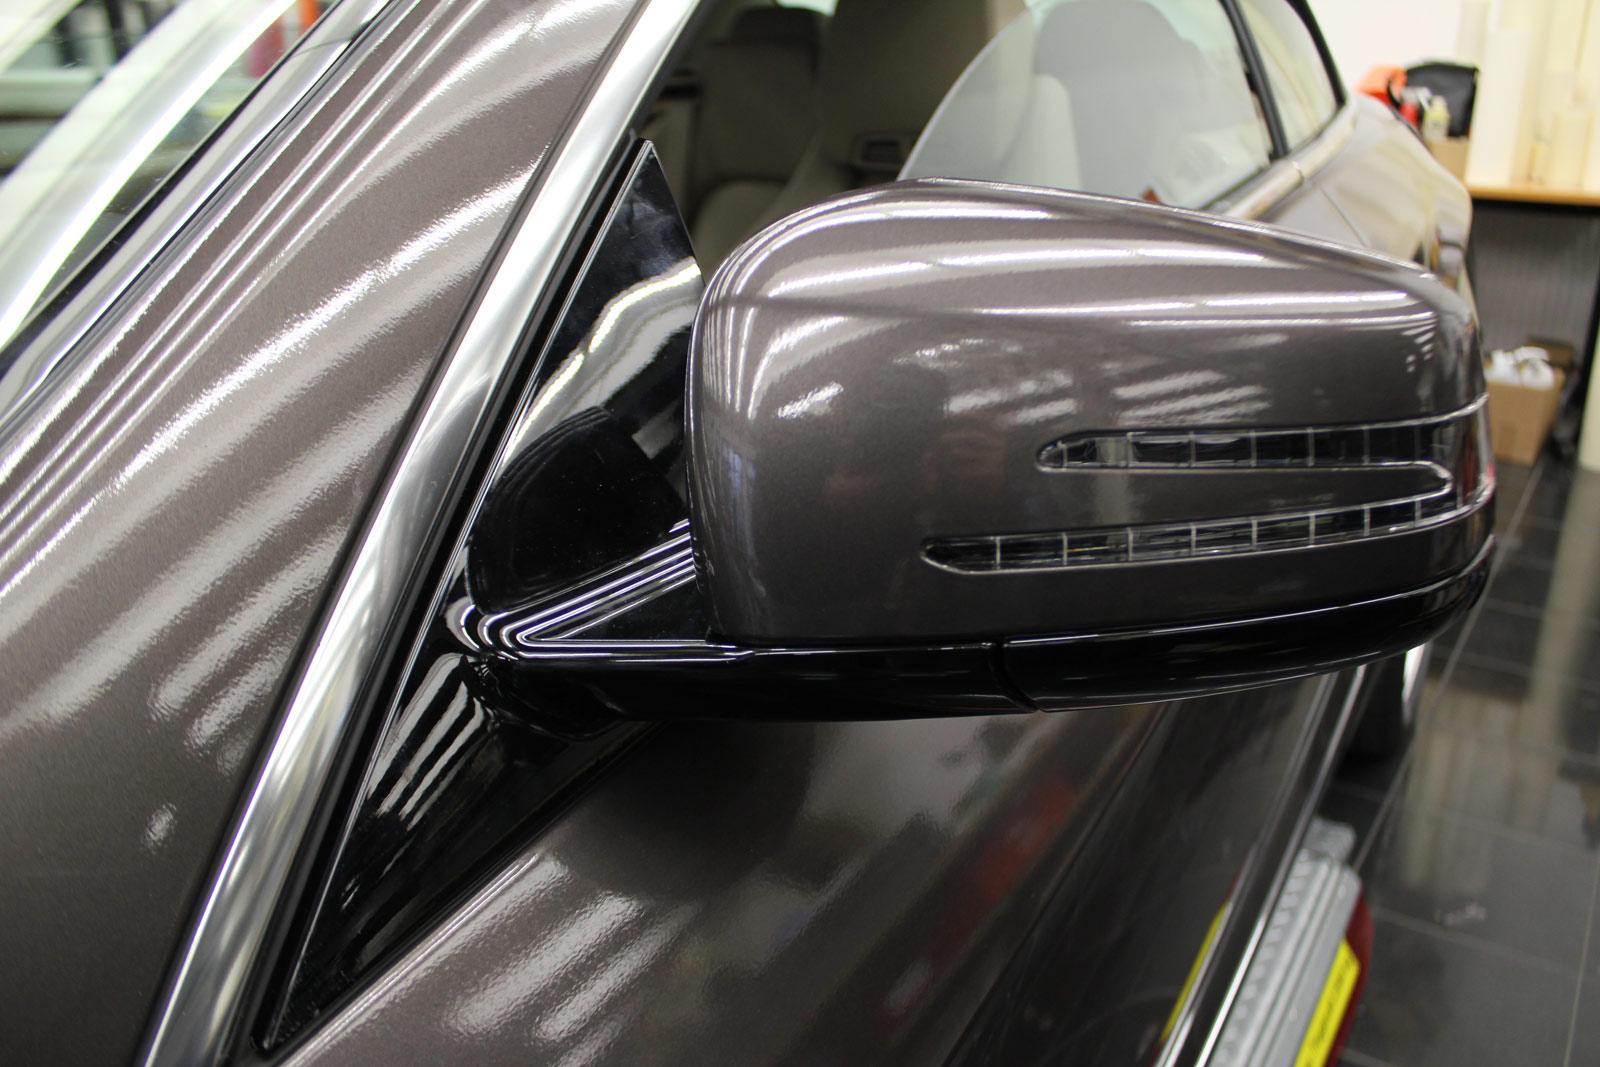 Mercedes_E-Klasse_Cabrio_Folierung_Stannitgrau_Metallic_Glanz_13